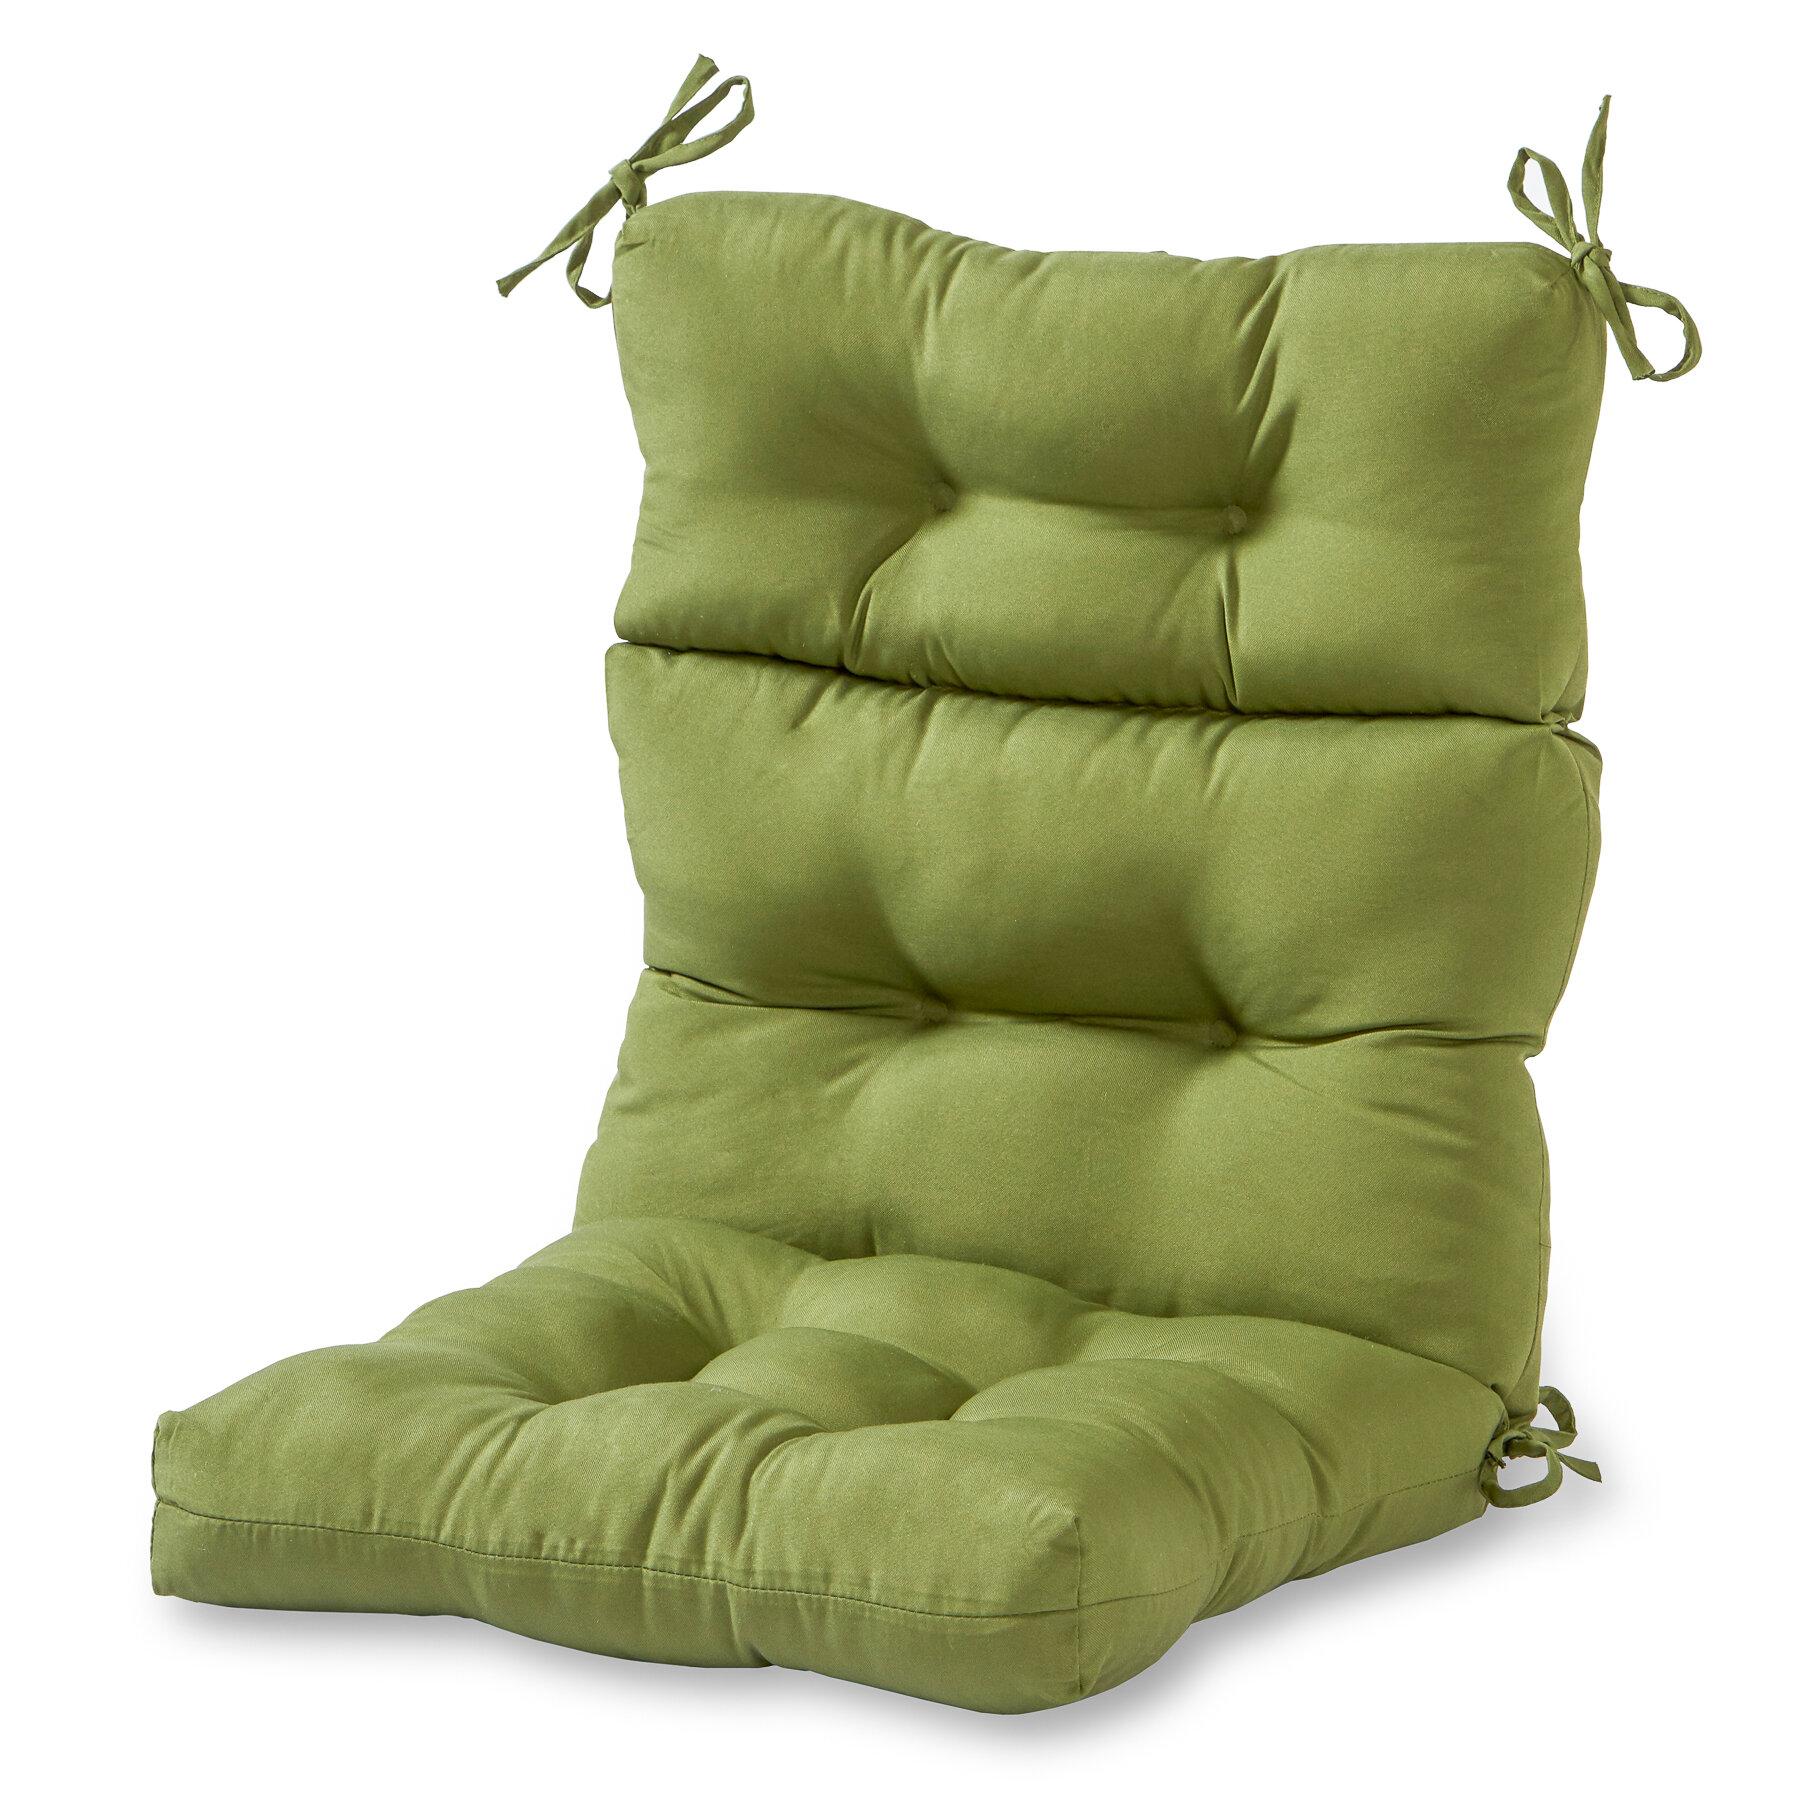 olivia chaise lounge green velvet cfm dream product master hayneedle oliviachaiseloungevelvetdream